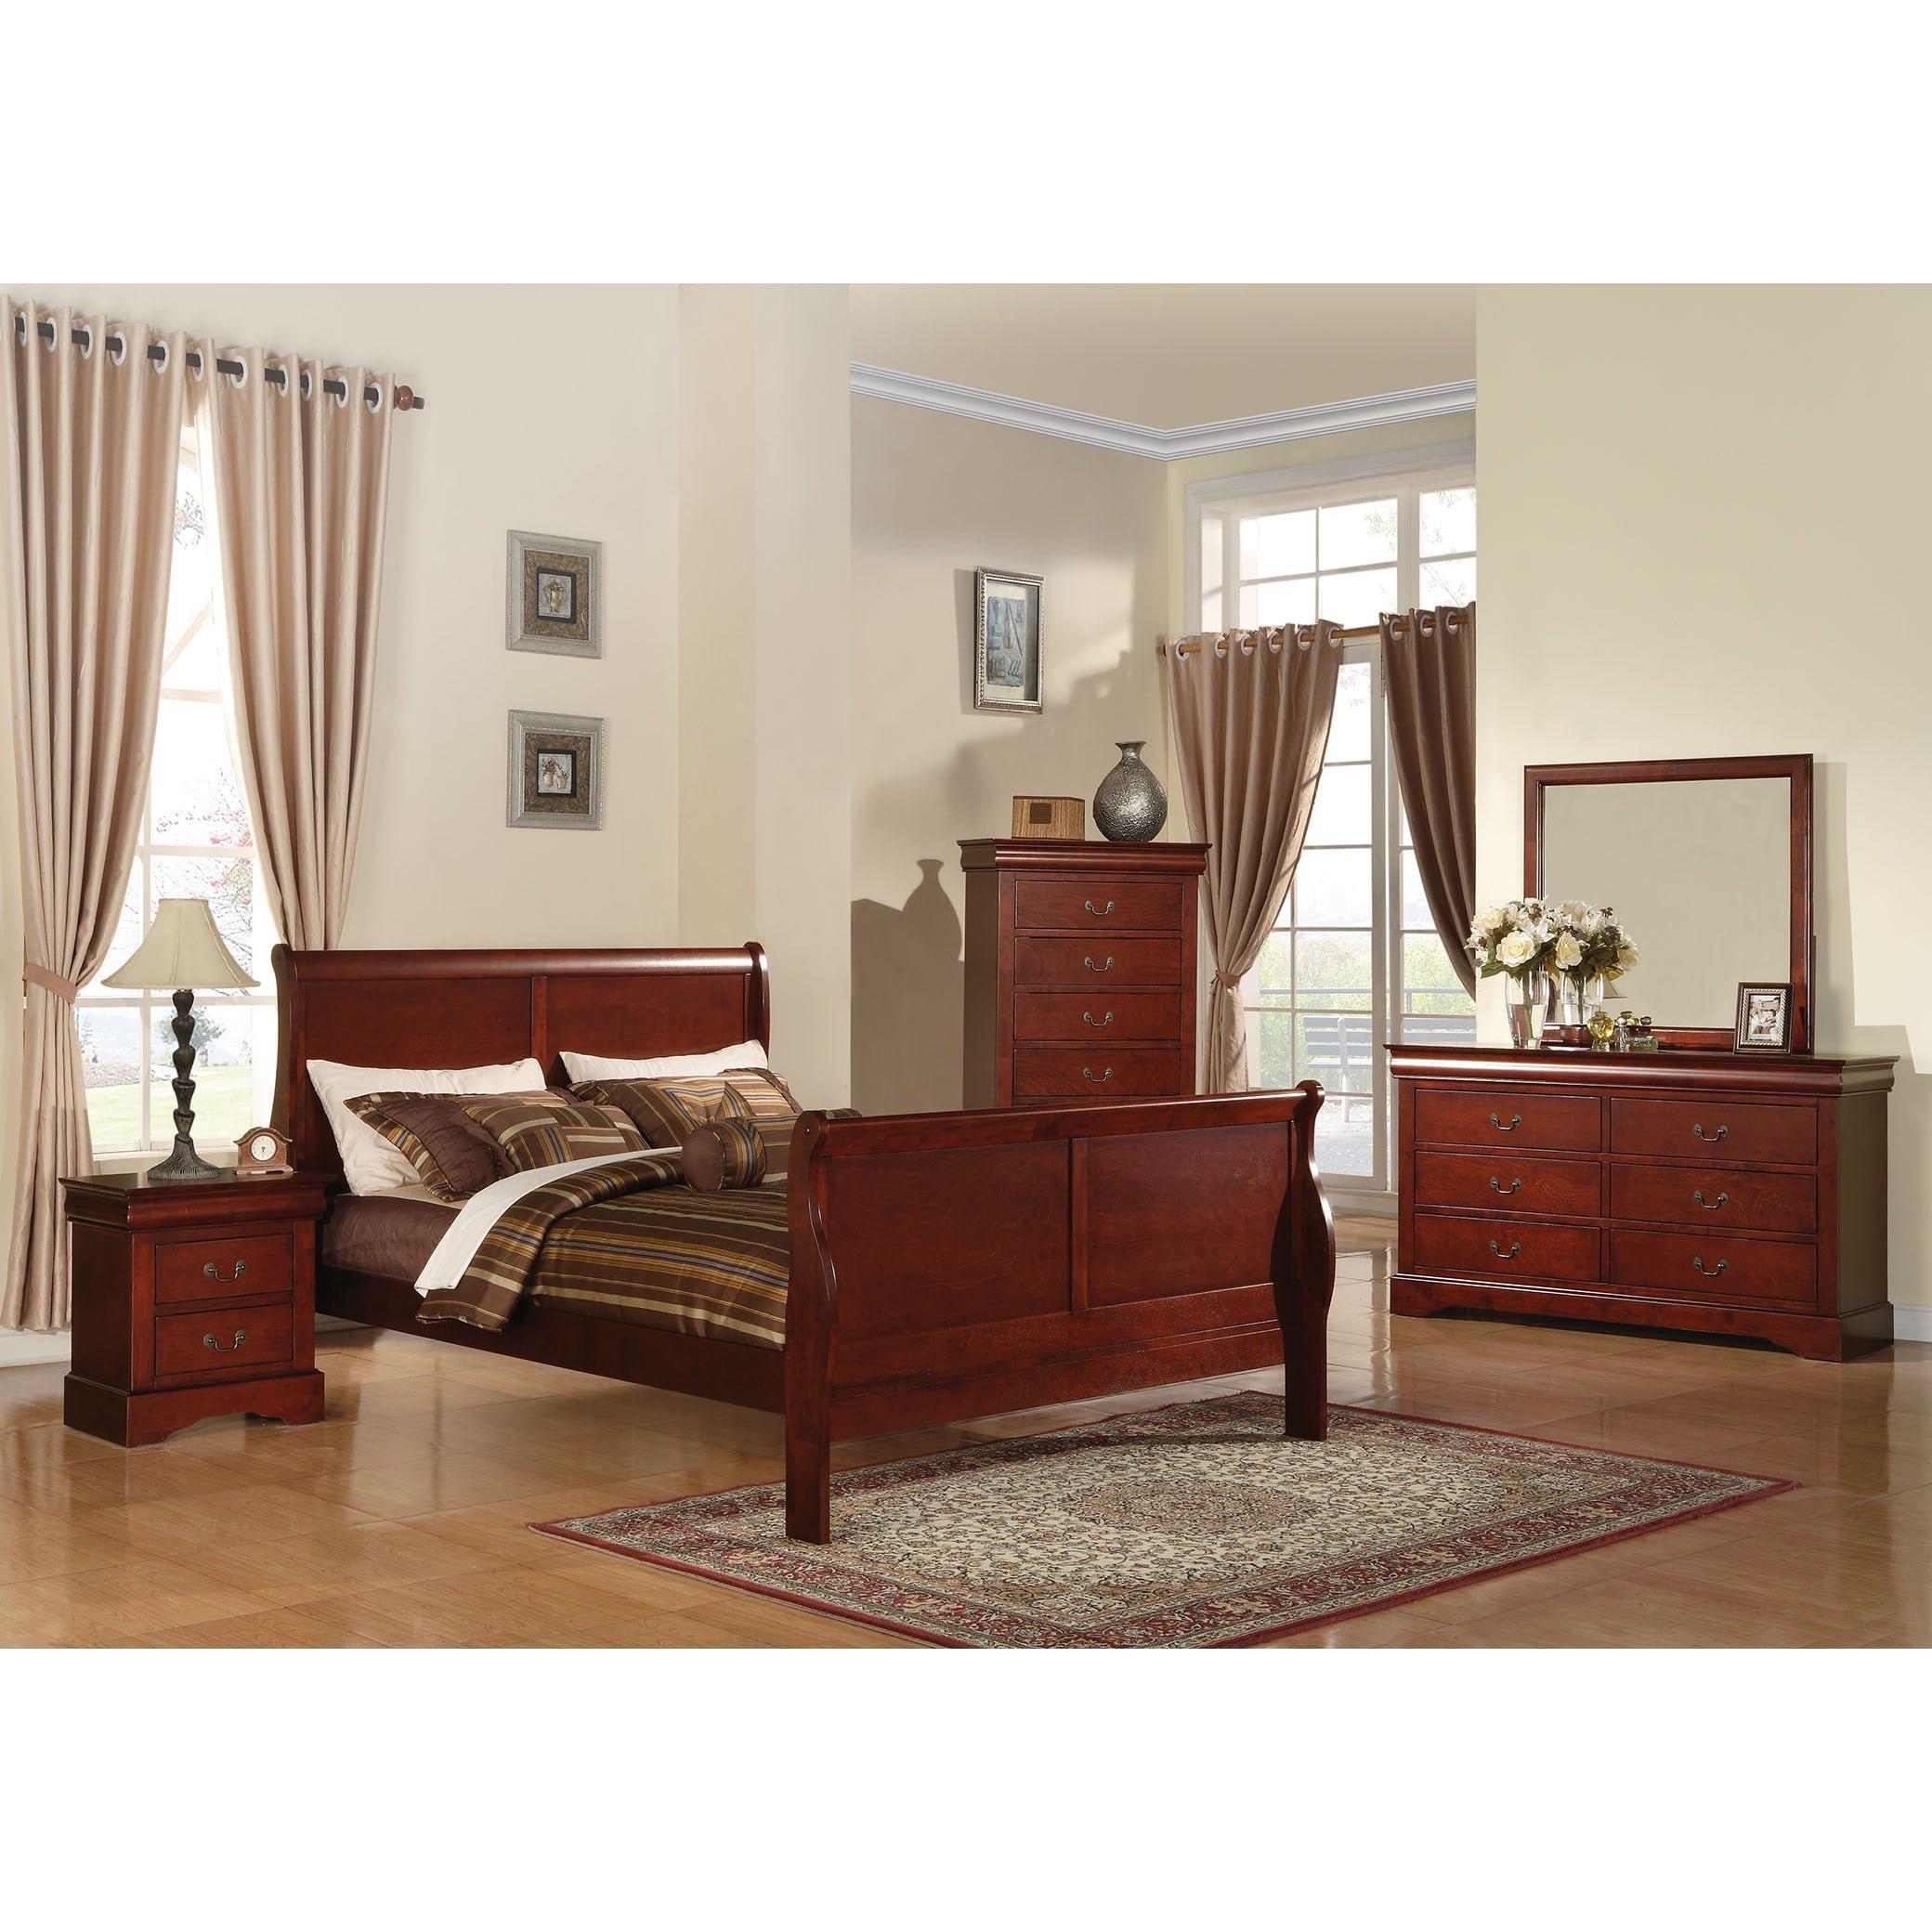 Acme Furniture Louis Philippe III 4-Piece Cherry Bedroom Set Eastern King